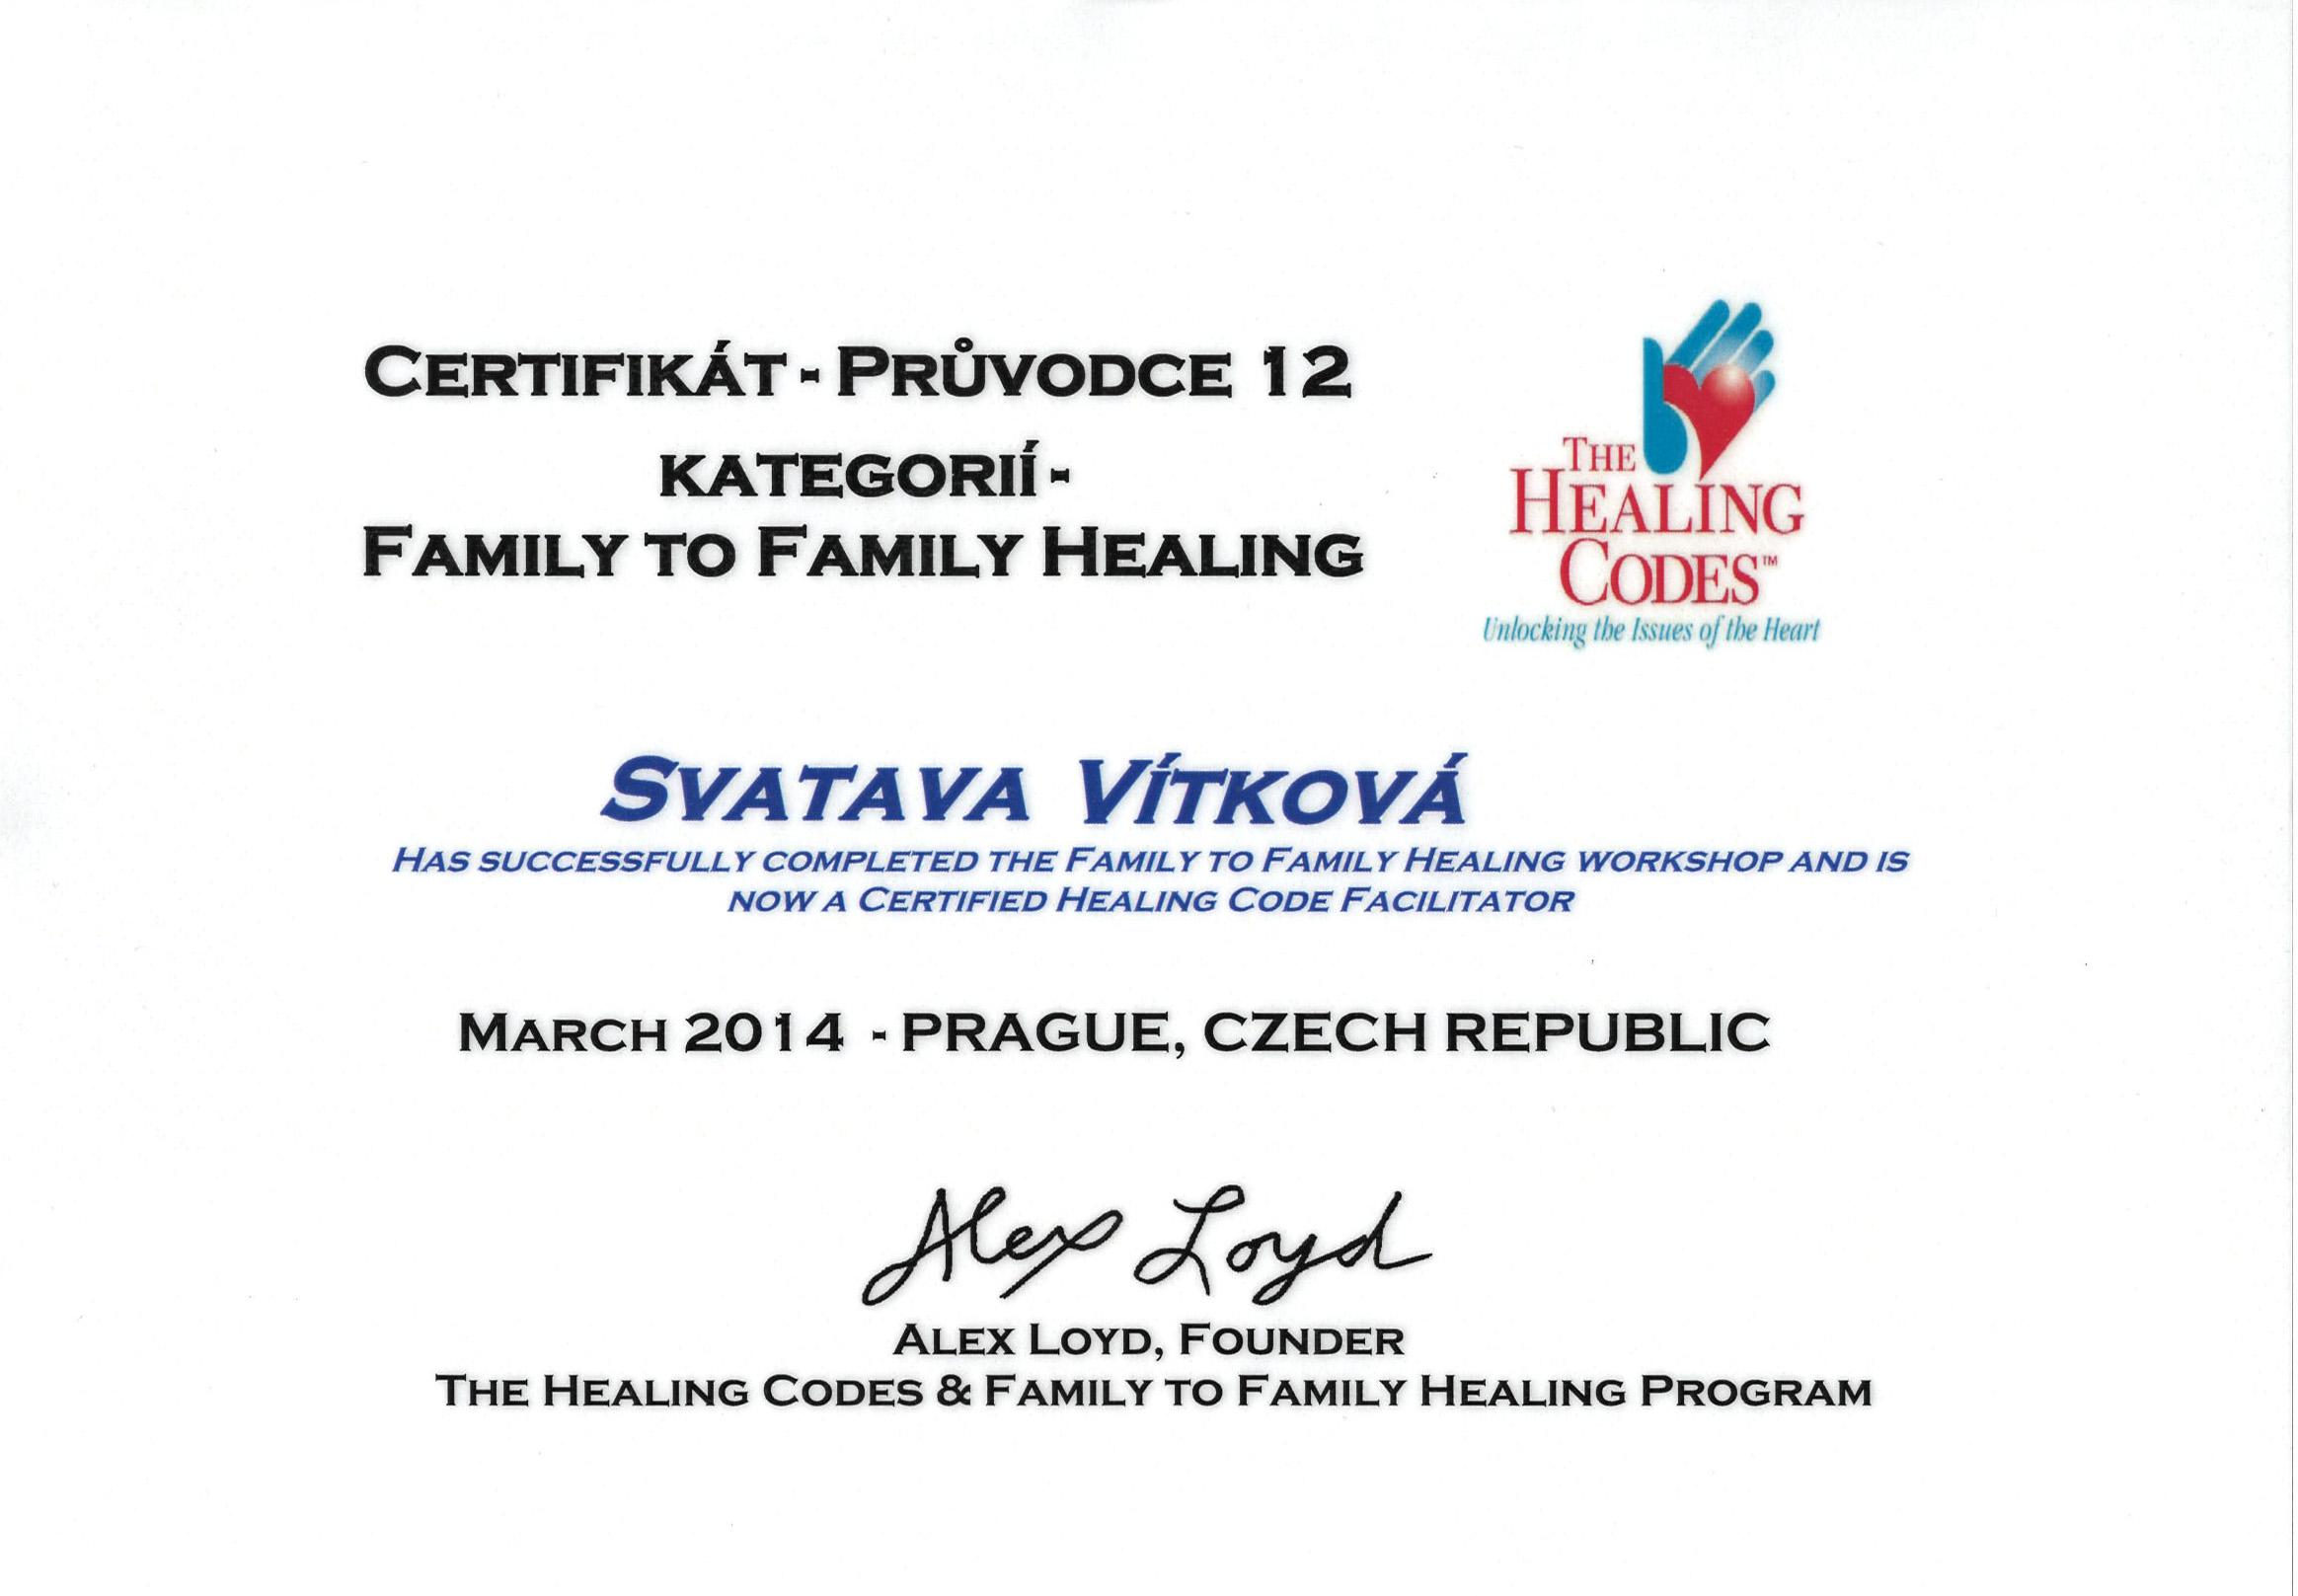 LK Certifikát